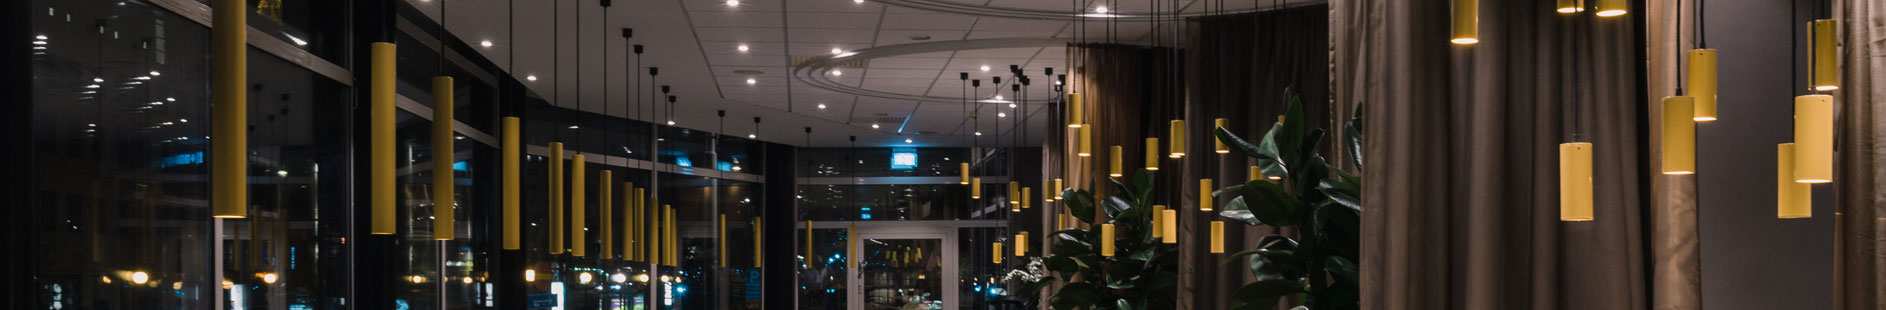 Scandic Opalen Konferensanläggningar.se